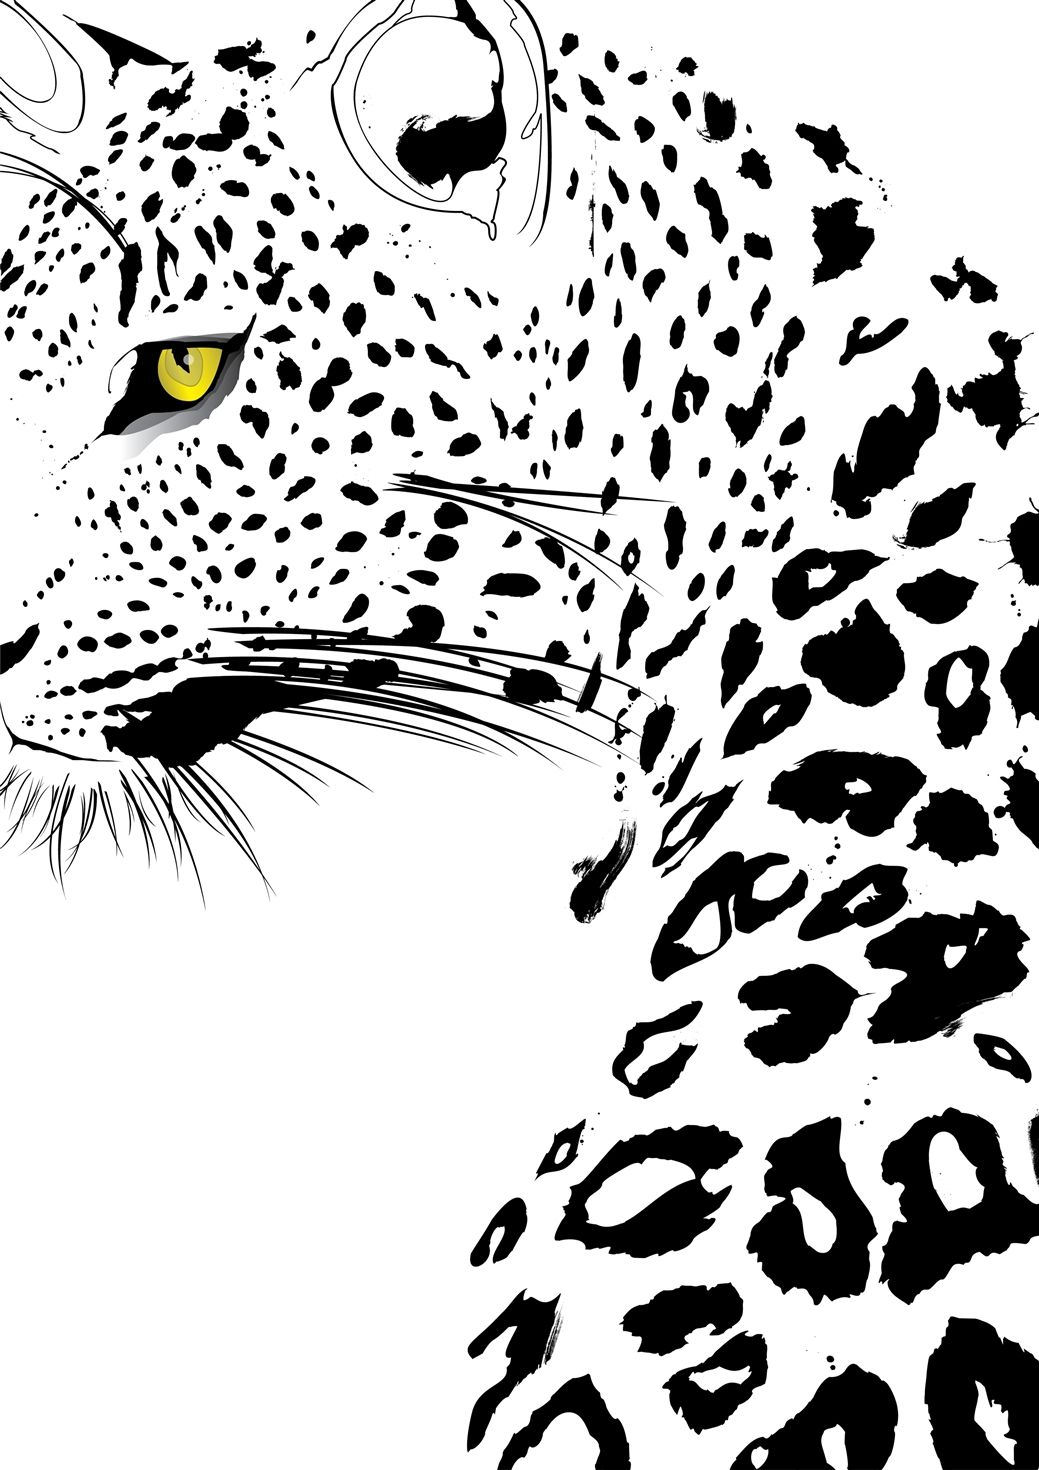 Big 5 Animals Silhouettes